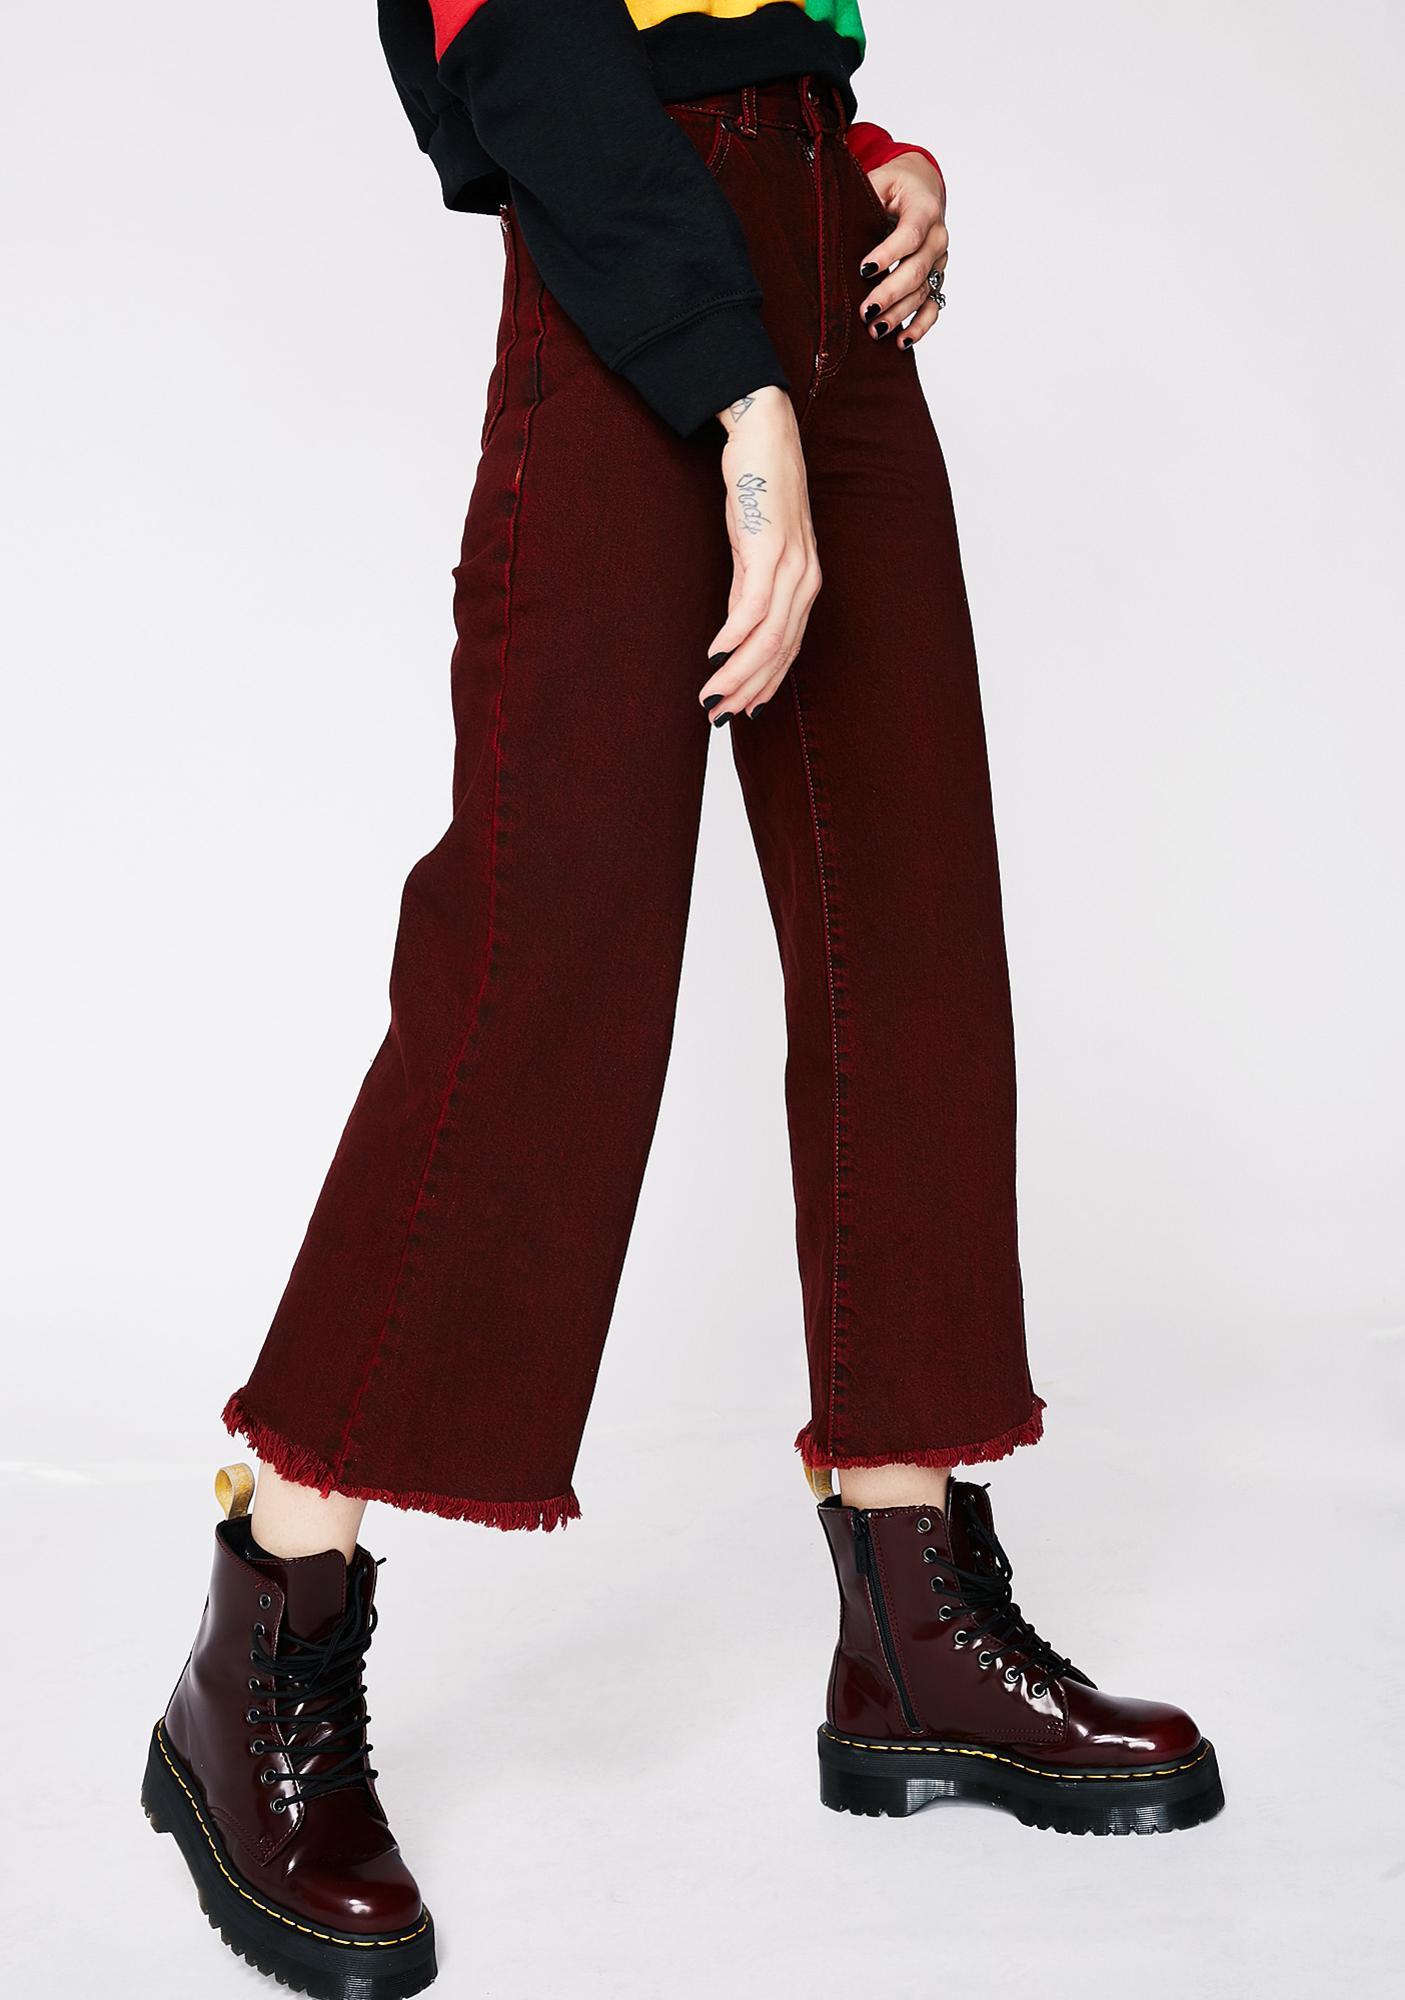 The Ragged Priest Clarat Jeans